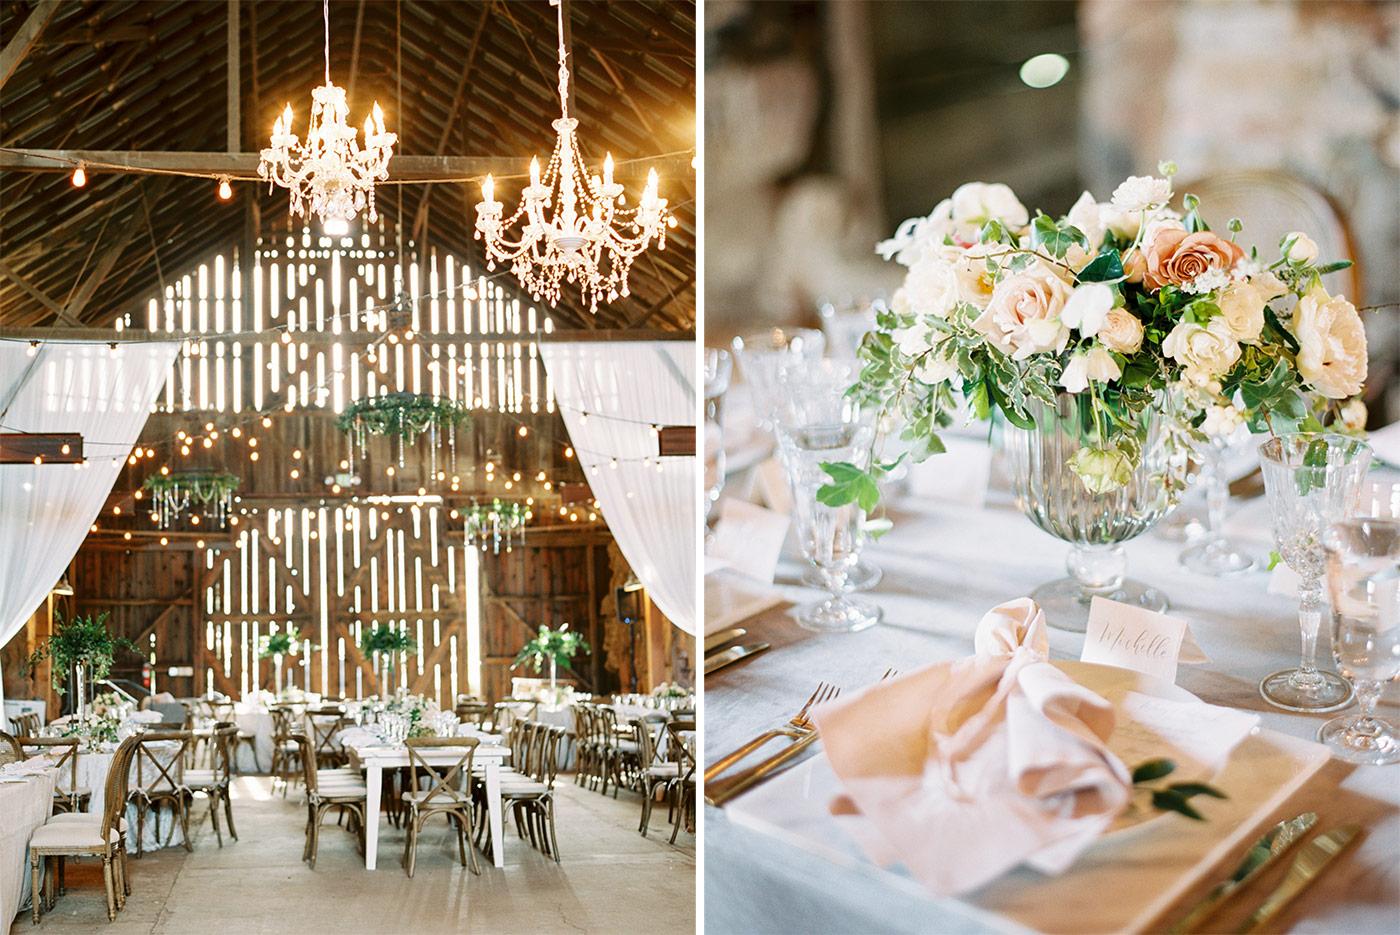 Elegant Fine Art Santa Margarita Rnach Wedding Photographed by Ashley Ludaescher